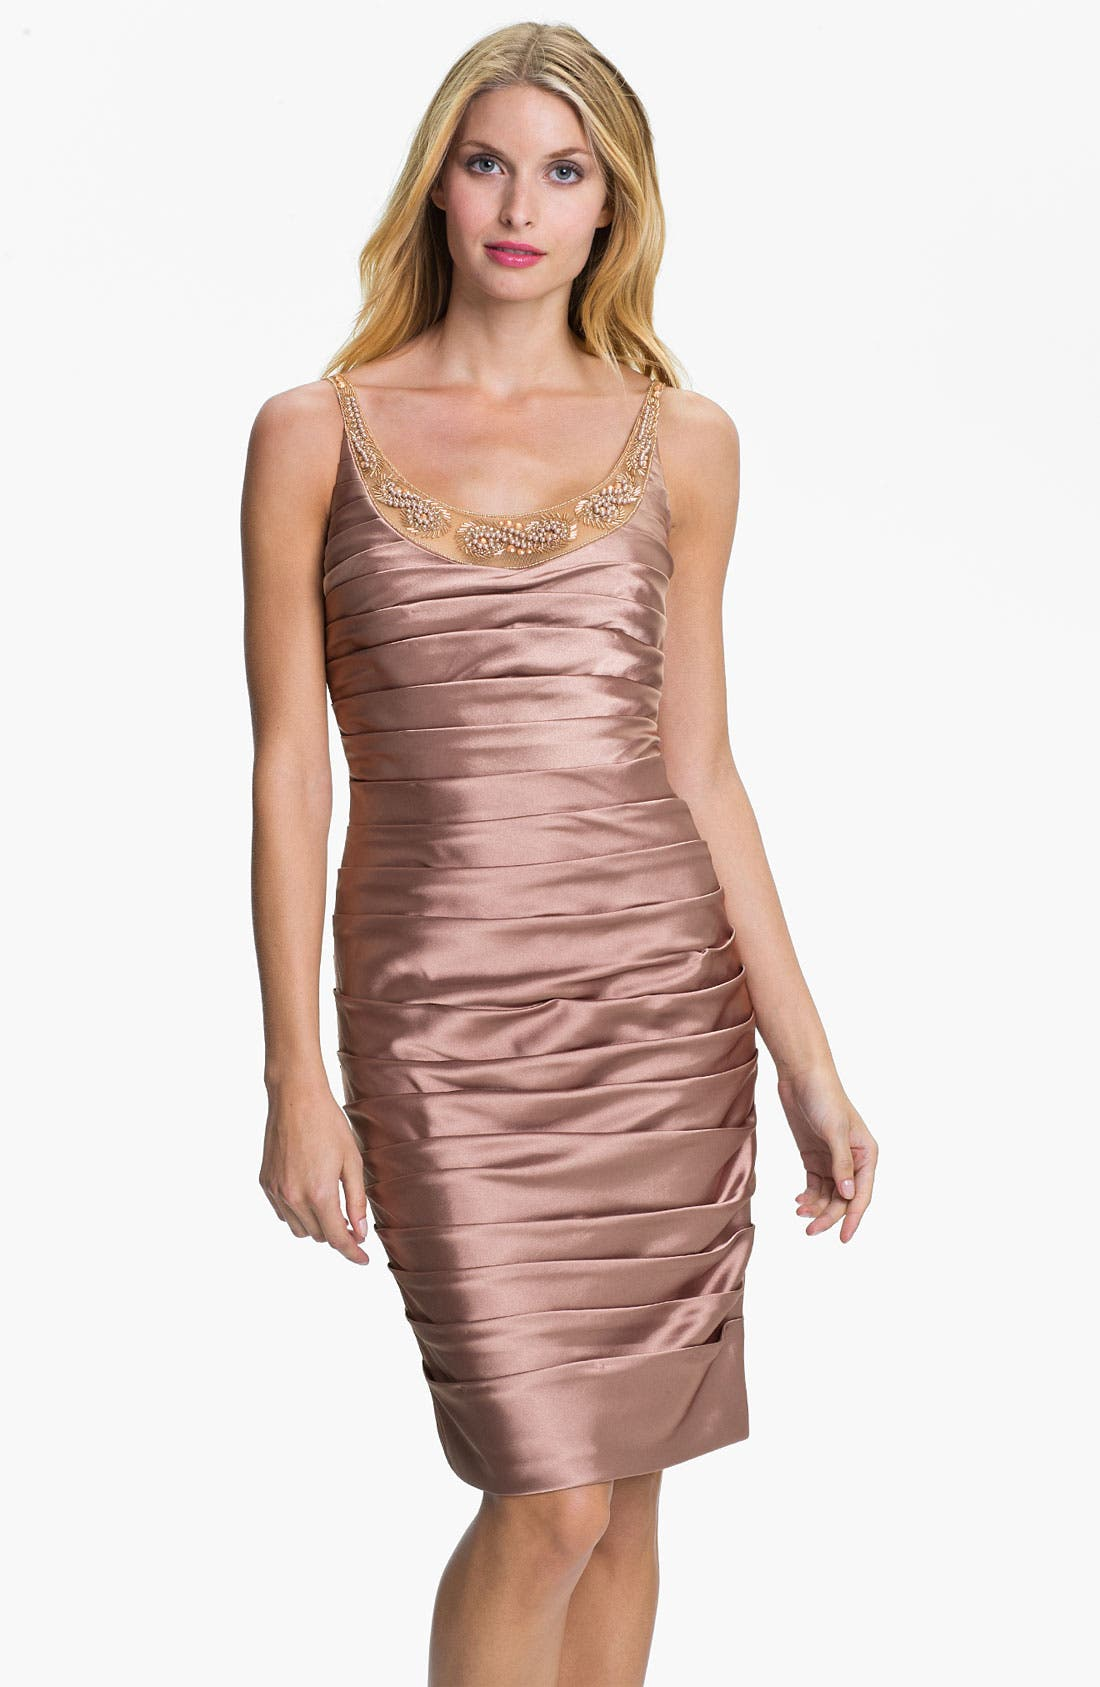 Alternate Image 1 Selected - Adrianna Papell Reverse Pleat Satin Sheath Dress & Bolero (Petite)